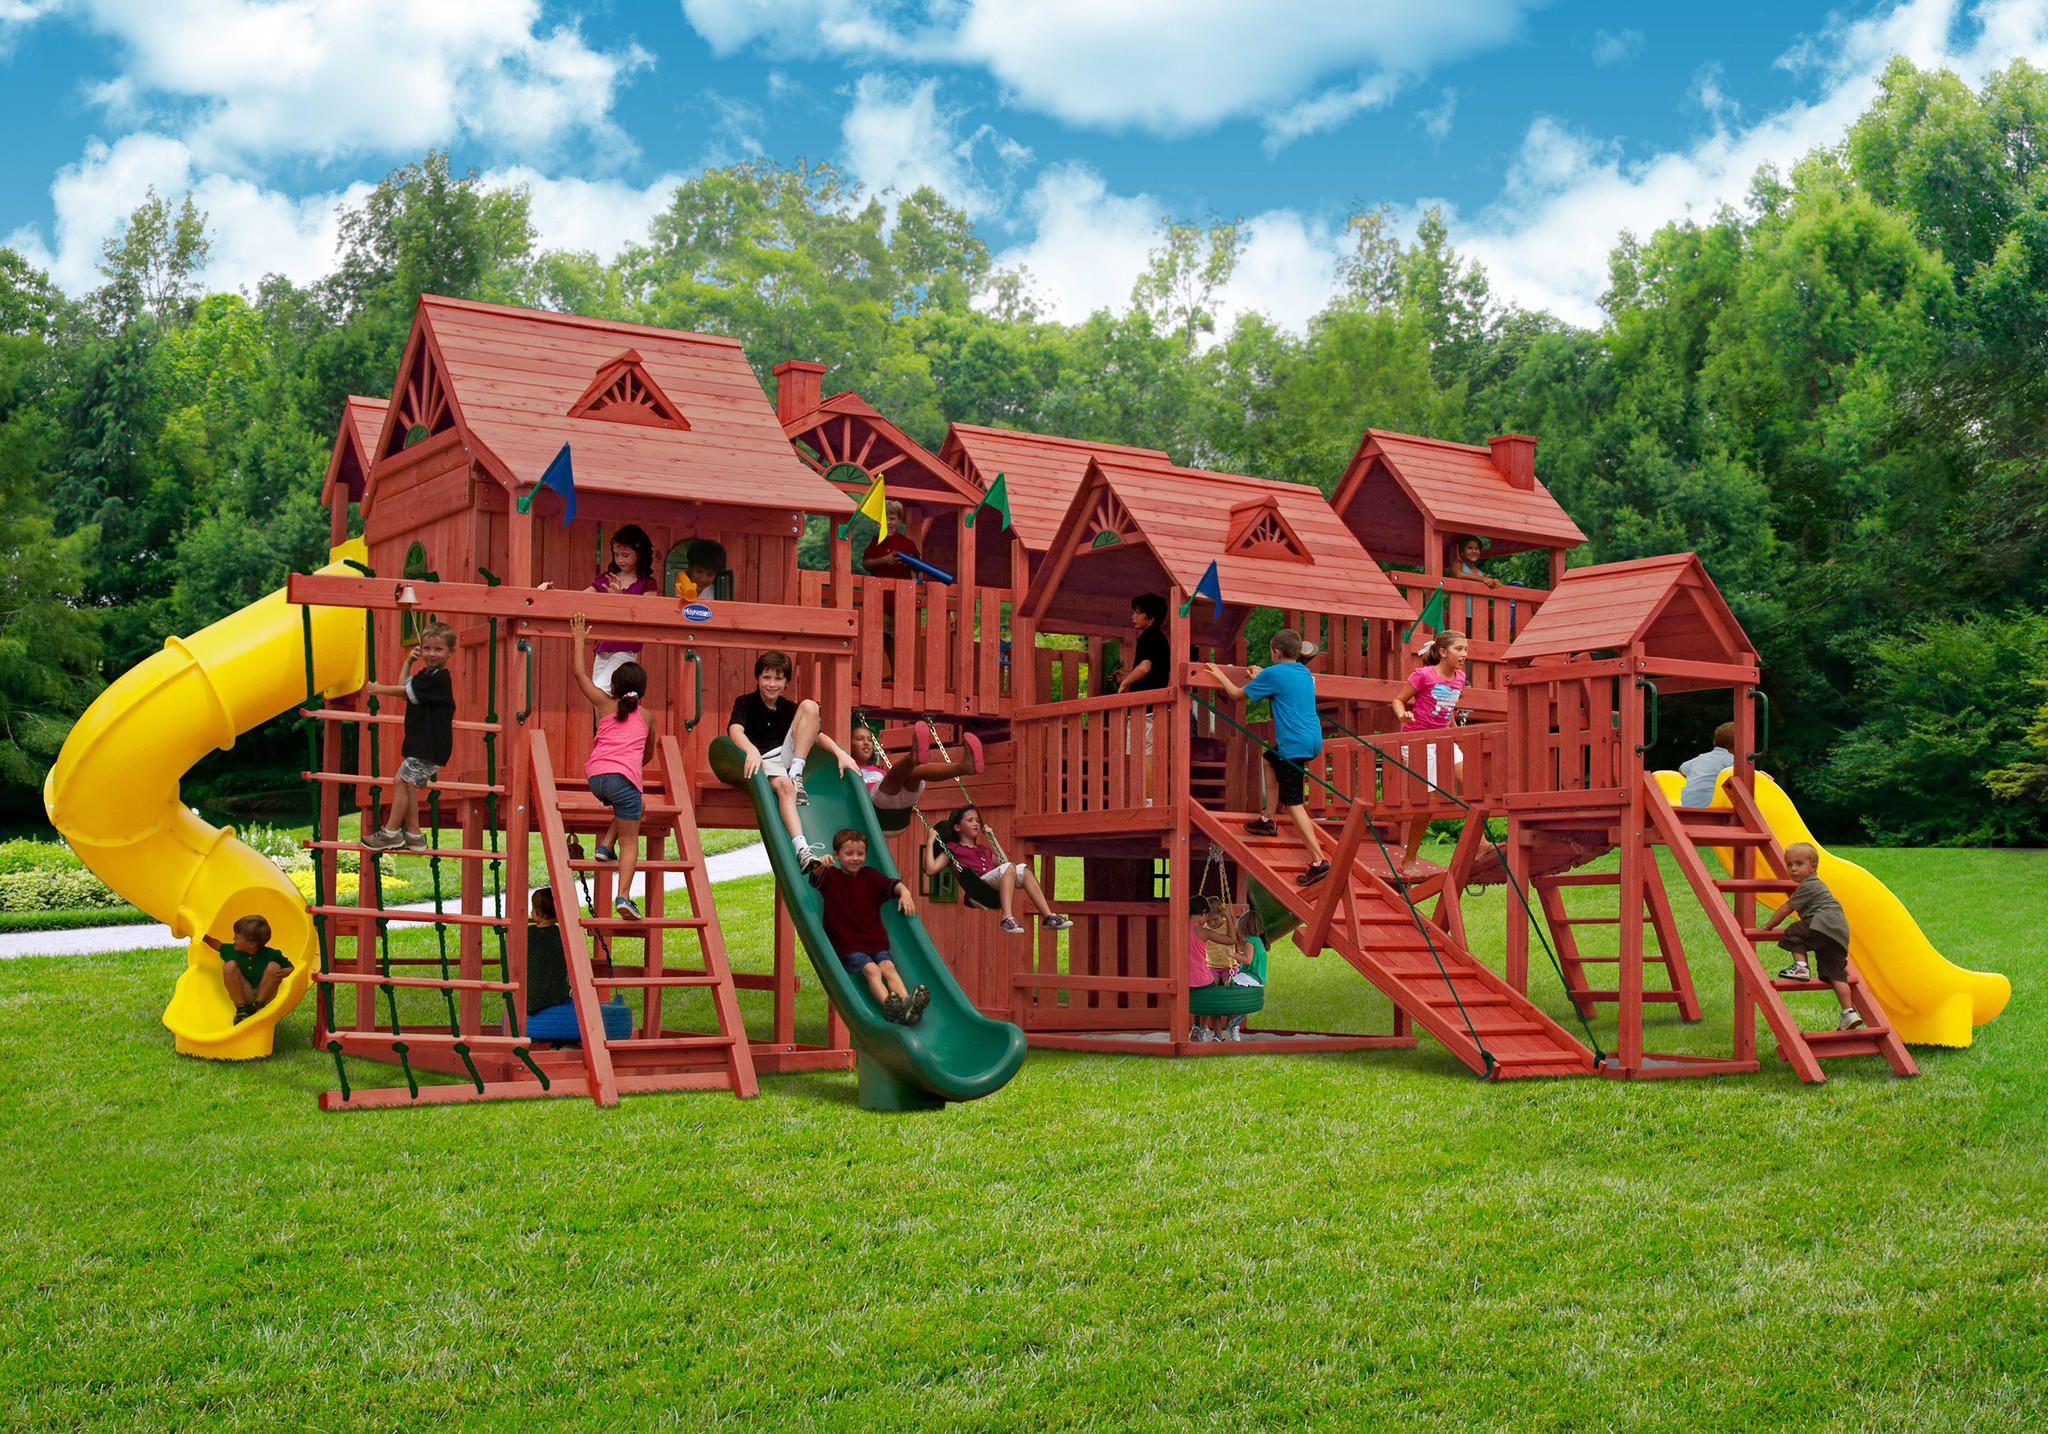 Gorilla Playsets Metropolis Wooden Play Set From Nj Swingsets Saved To Backyard Playground Play Backyard Playground Backyard Play Equipment Backyard Playset